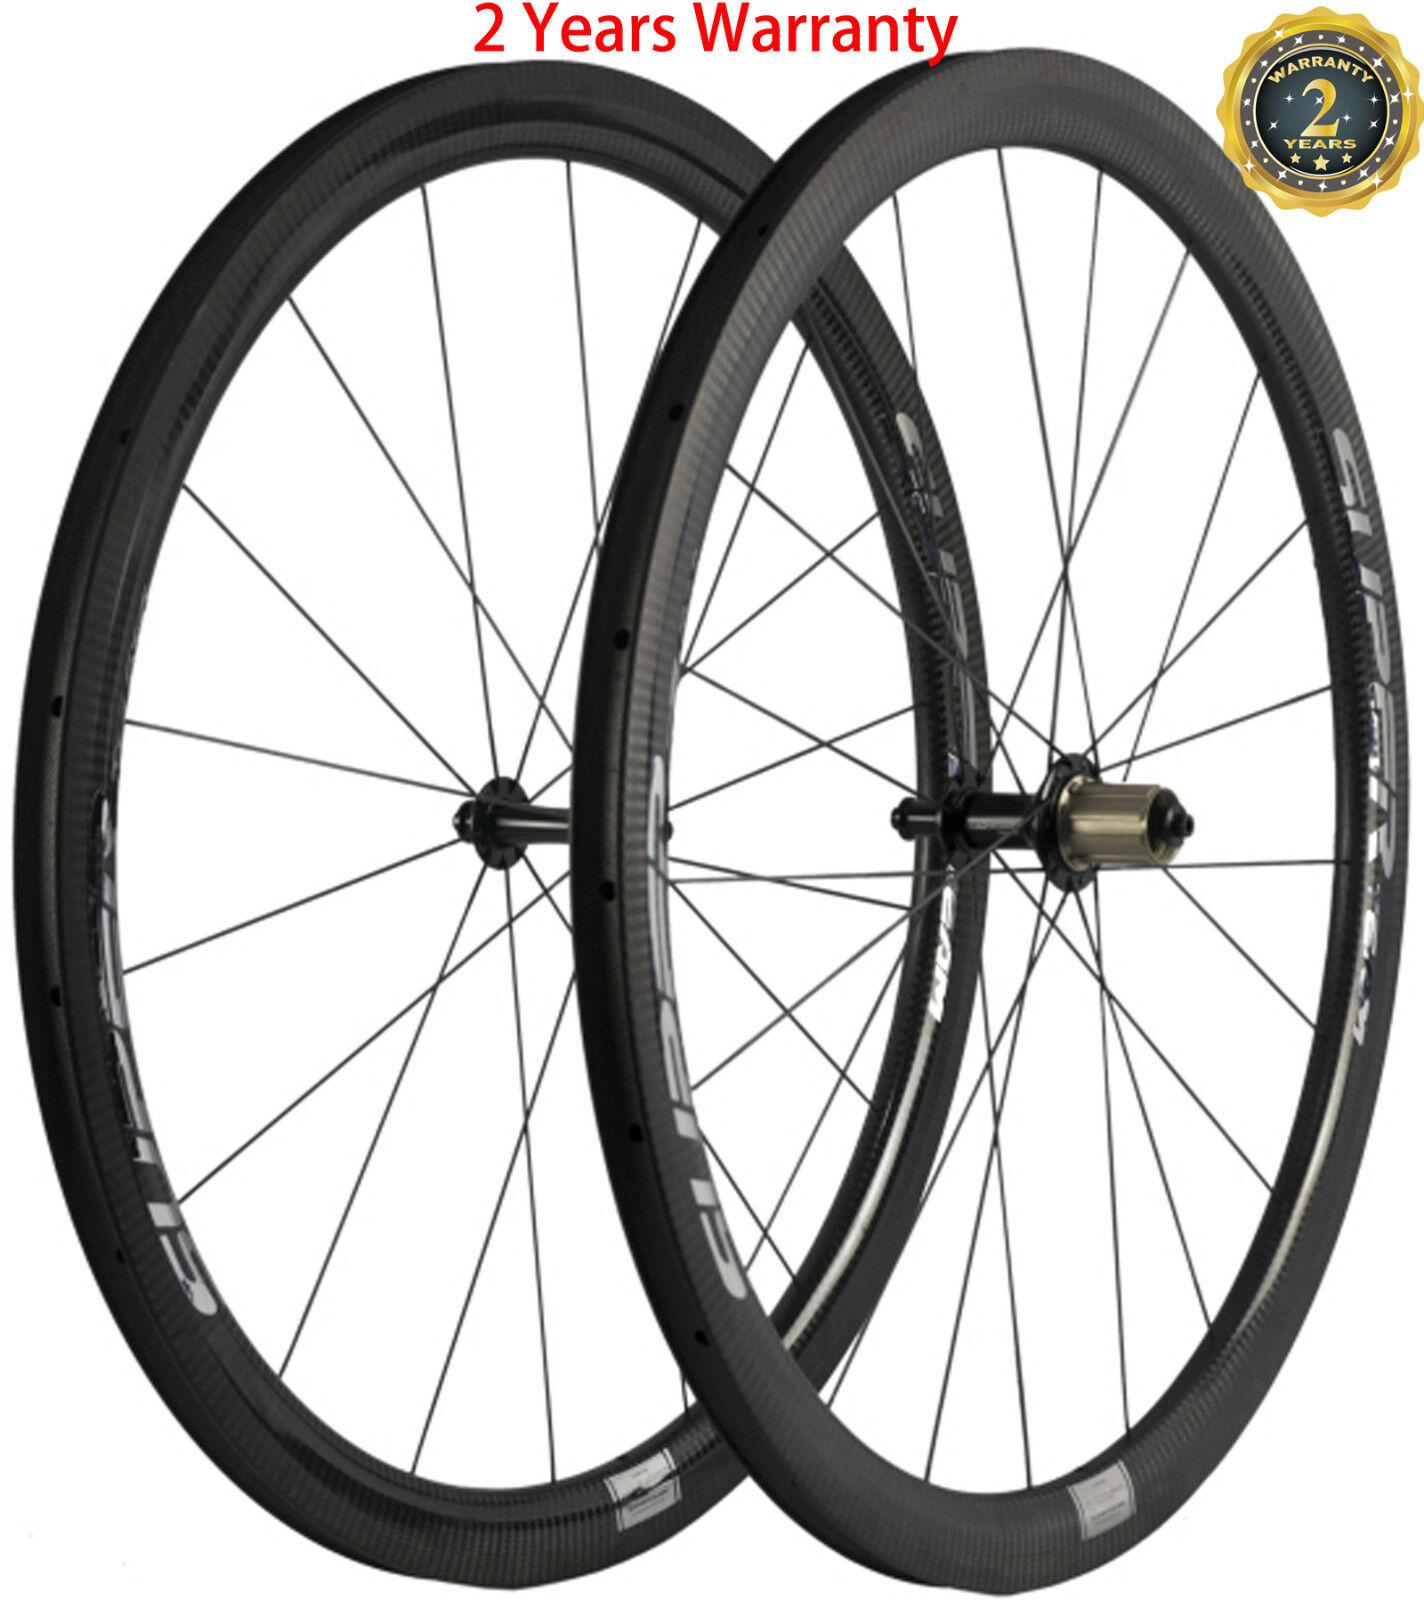 1342g Light Weigt Road  Bike Wheels 40mm Depth 25mm U Shape Wheelset Smith Hub  hottest new styles